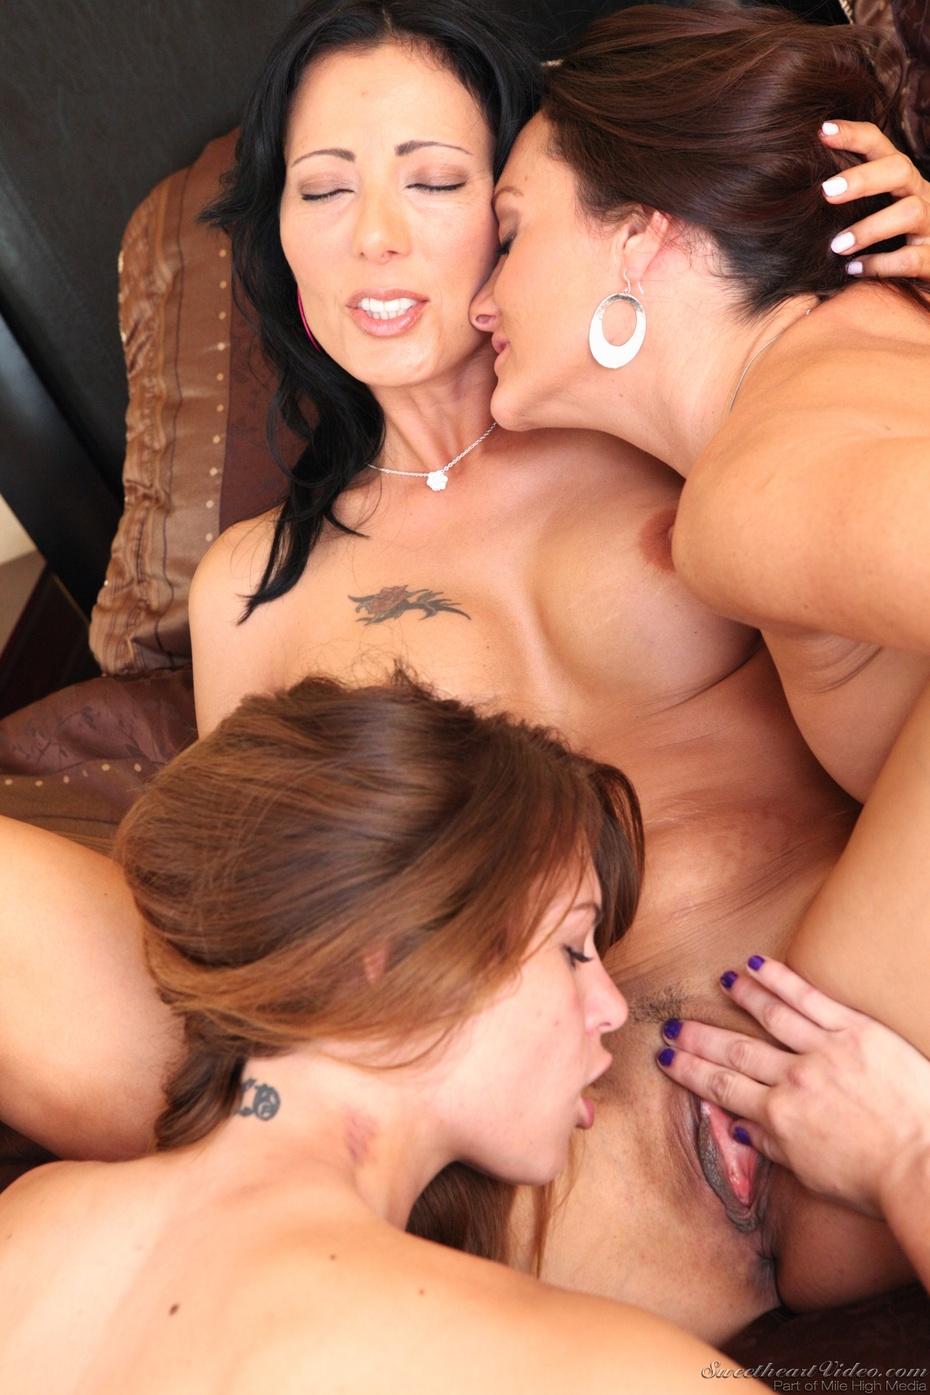 Actrices Porno Lesbica trío lésbico entre kasey chase, michelle lay y zoey holloway